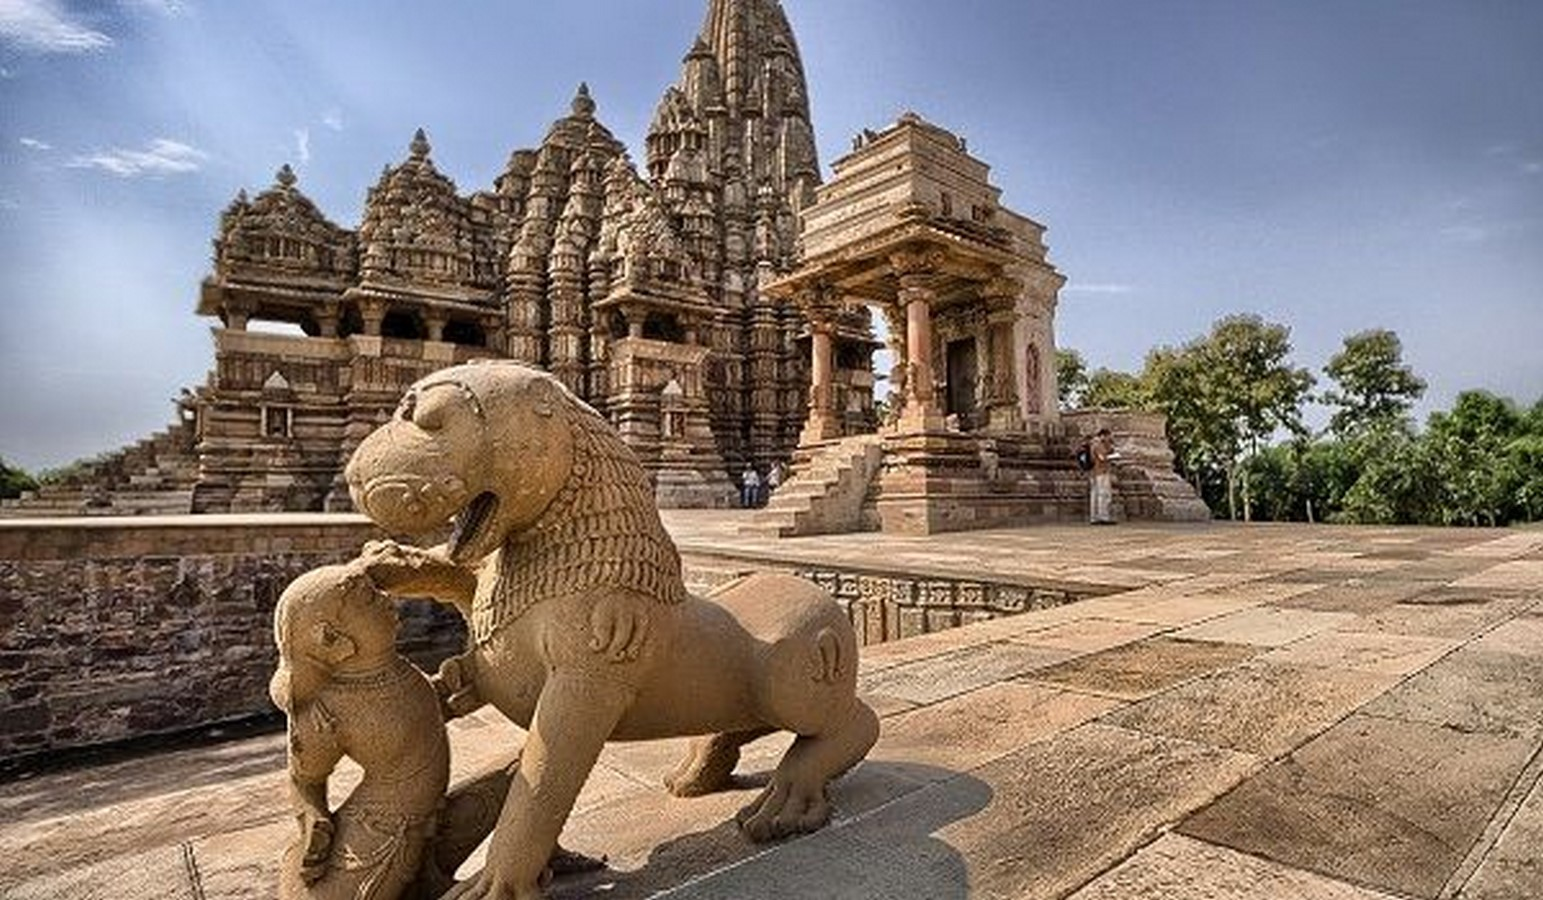 The Temple Complex at Khajuraho, Madhya Pradesh - Sheet3